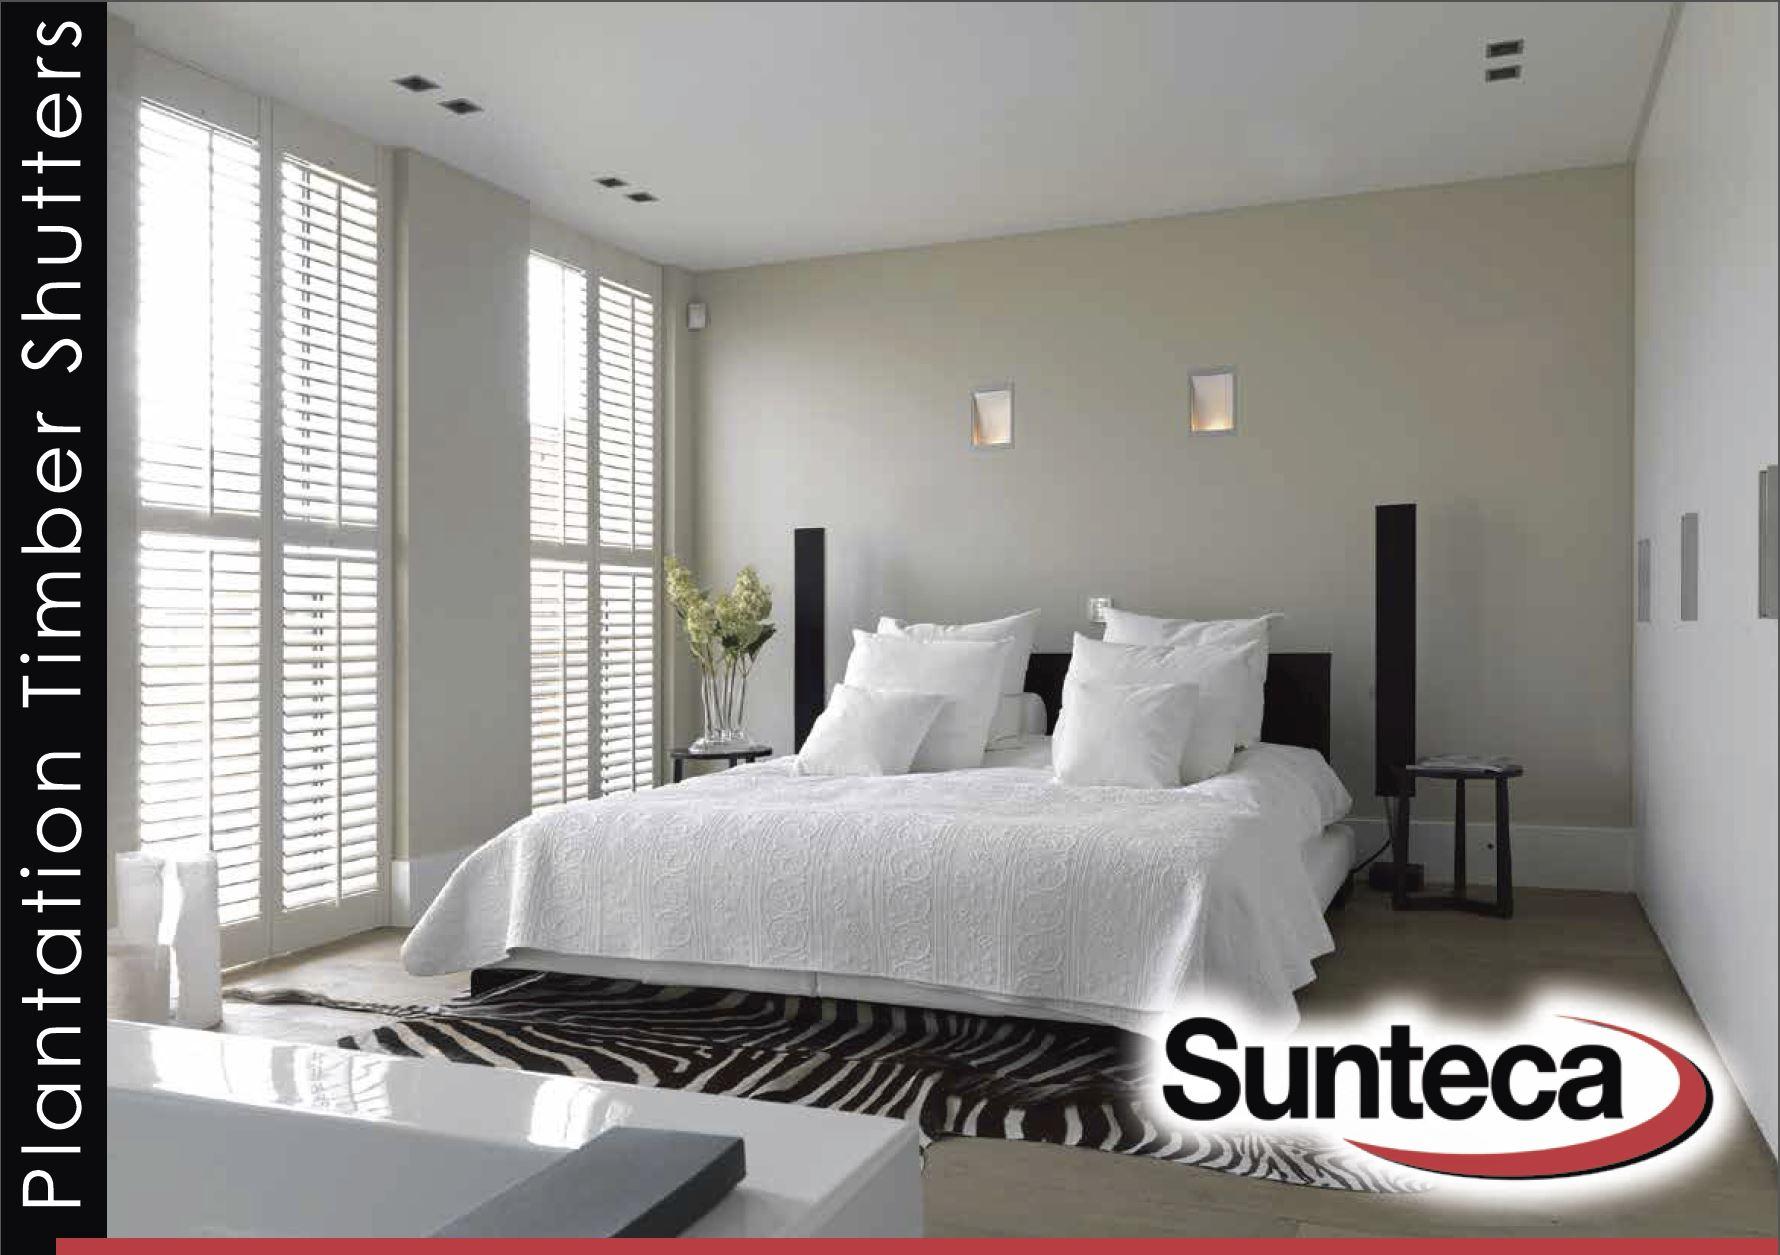 Sunteca Plantation Timber Shutters